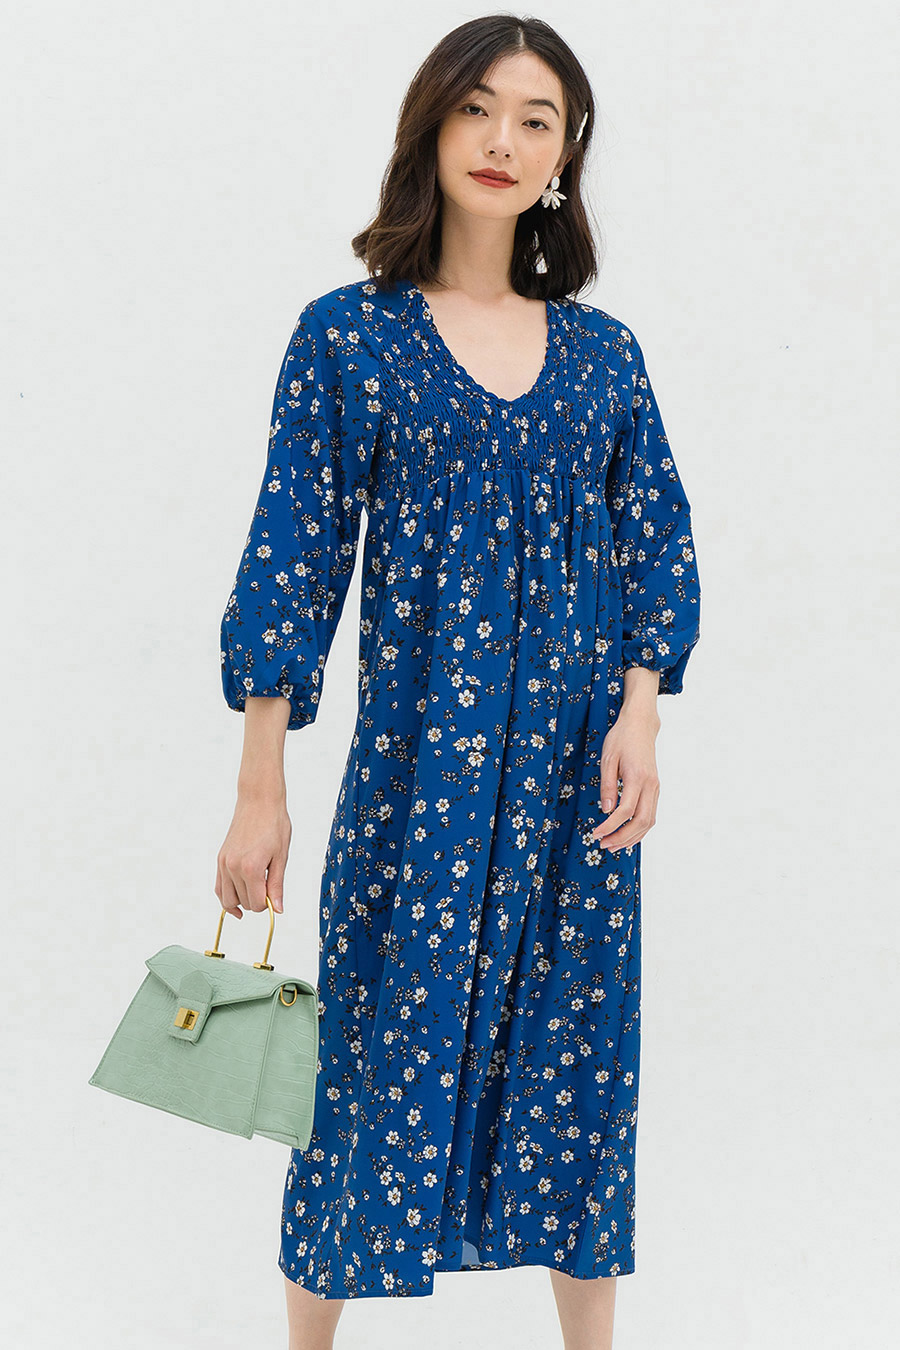 CAROLE DRESS - NAVY FLEUR